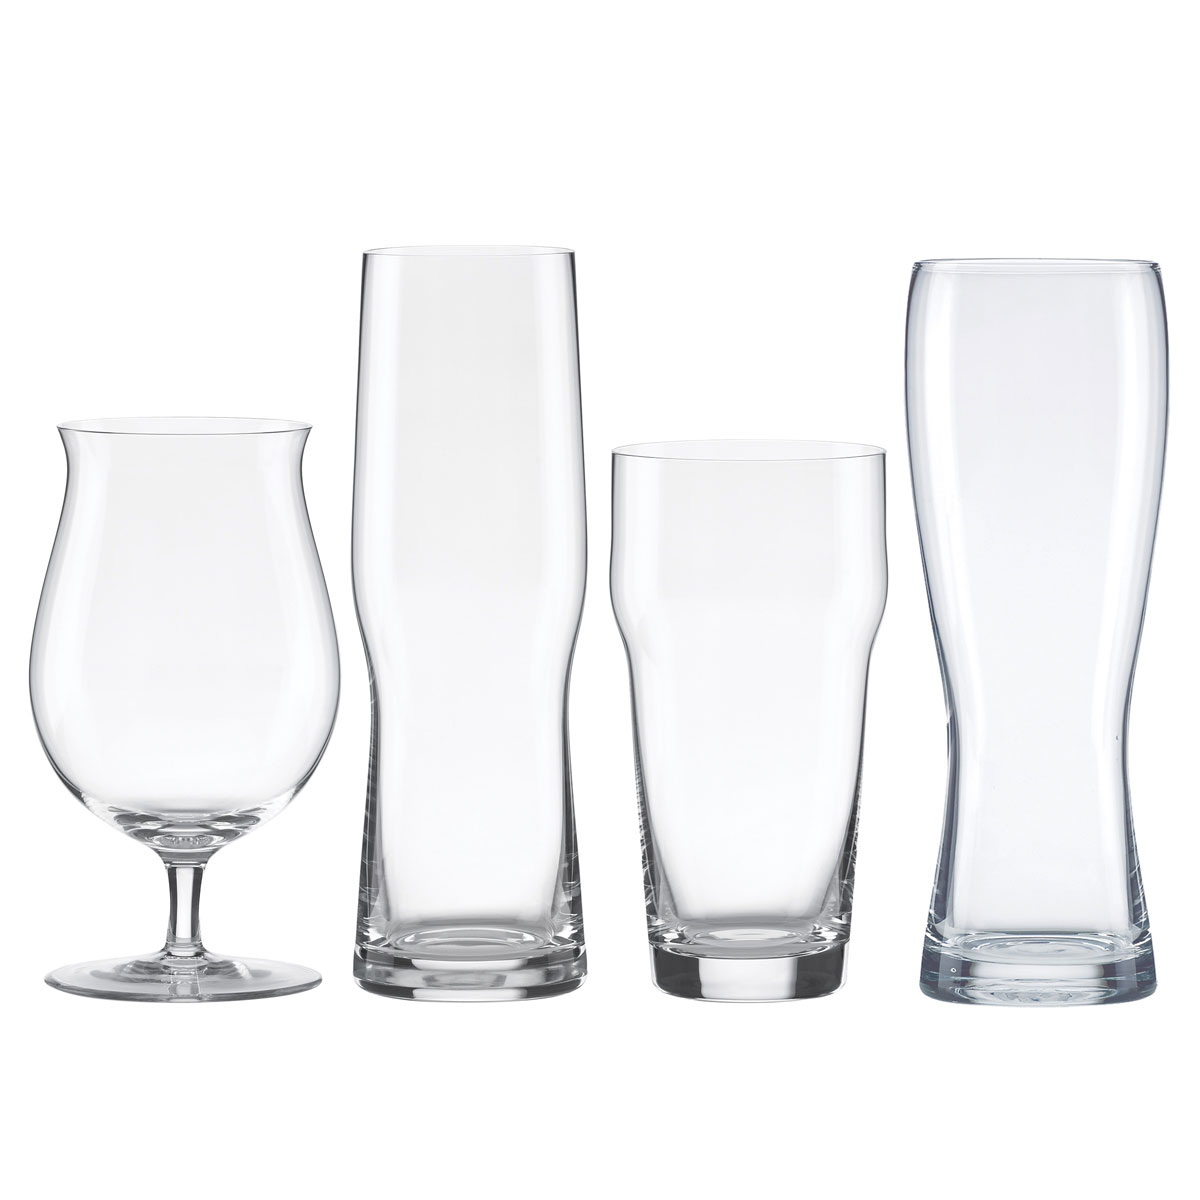 Lenox Tuscany Assorted Crystal Beer Glasses, Set of 4